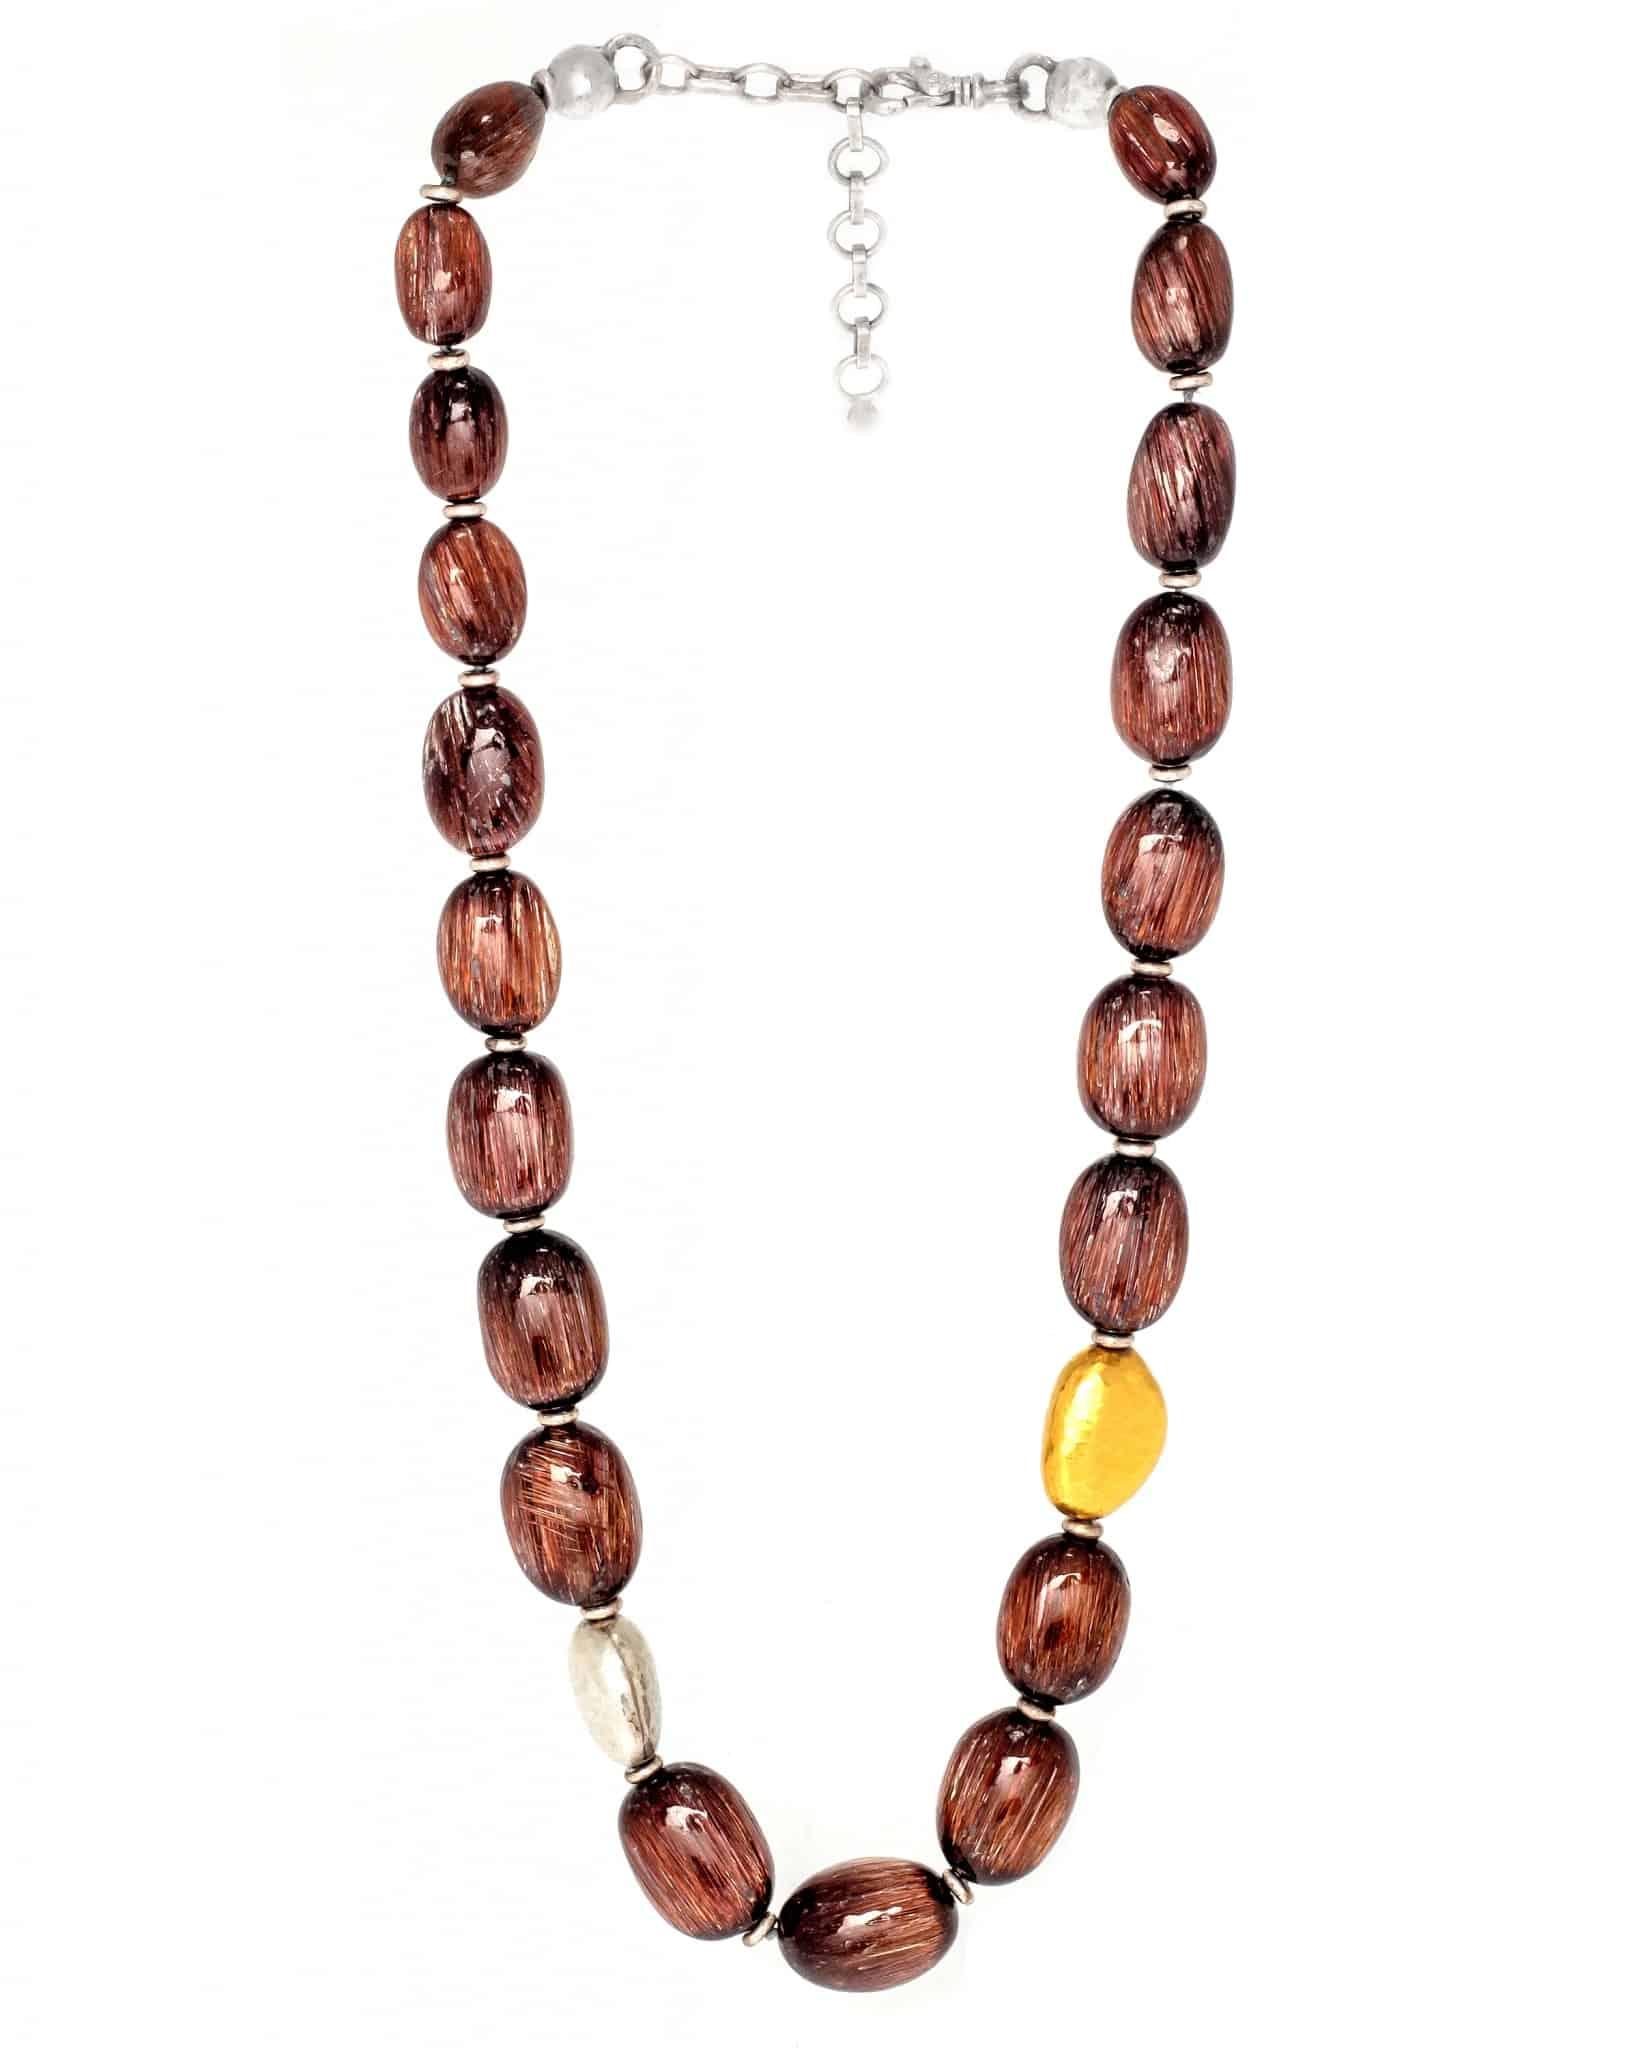 GURHAN Silver, Gold & Quartz Galapagos Necklace SN-U14478-RQB-S14D